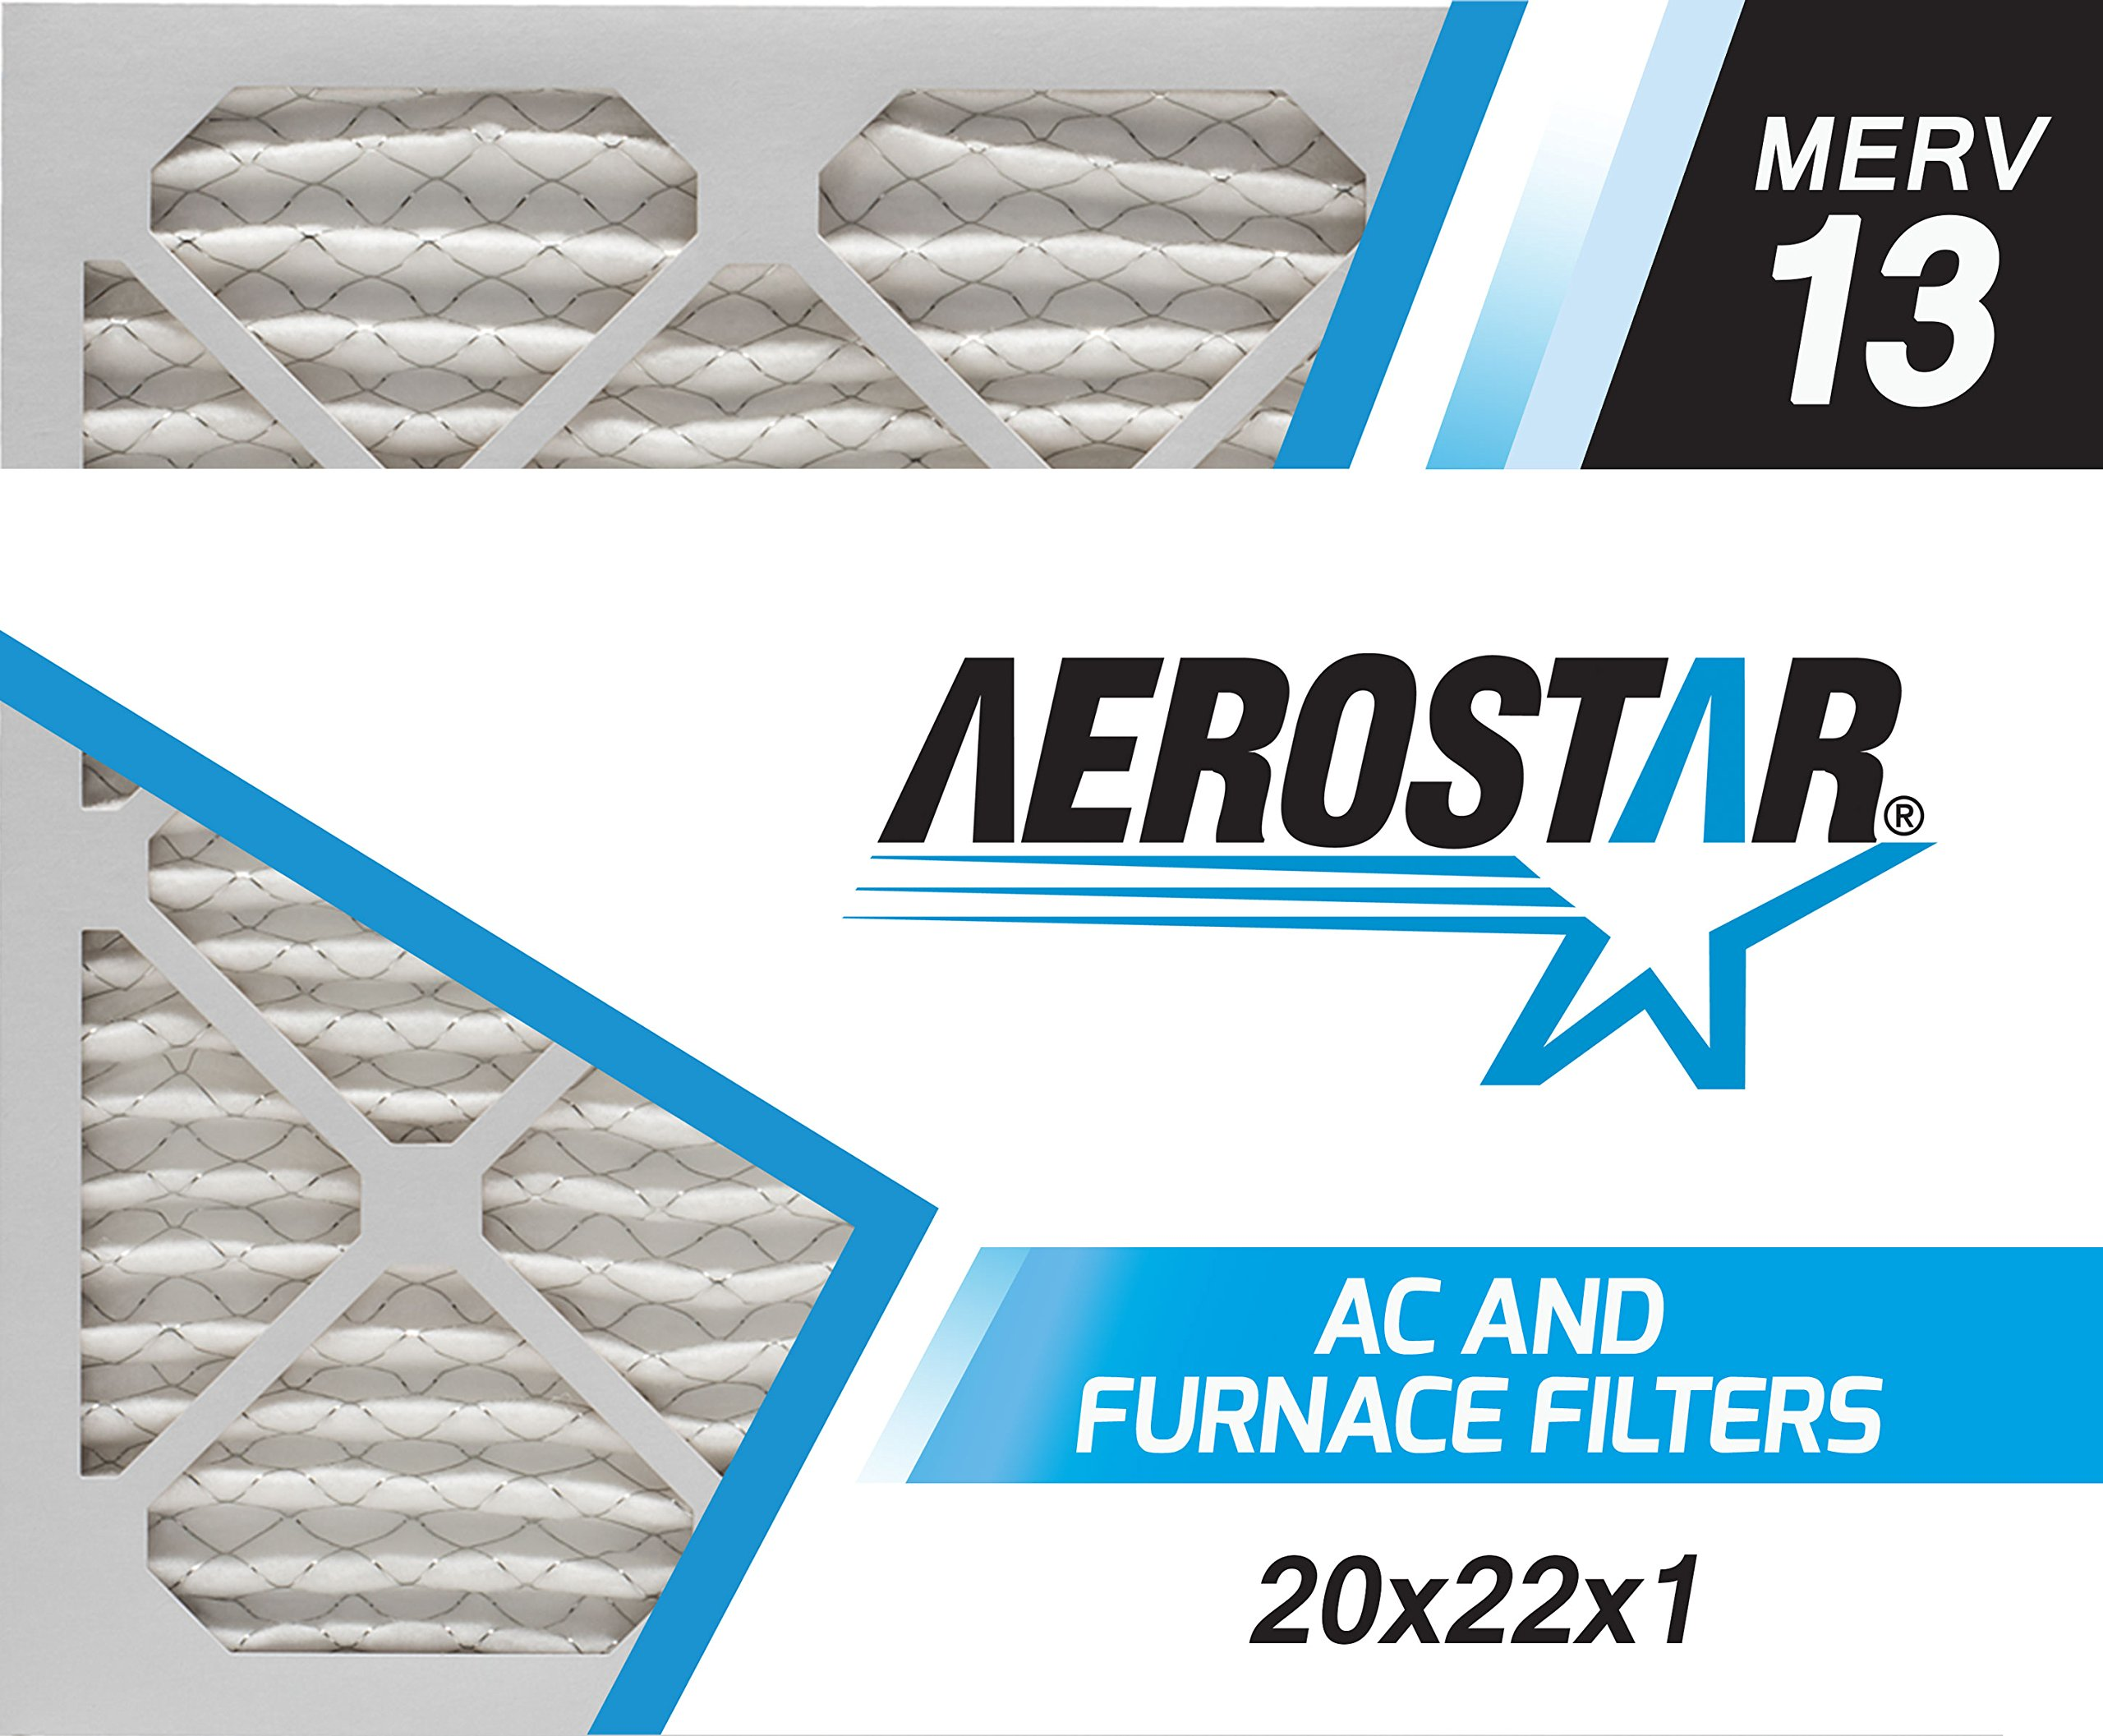 Aerostar 20x22x1 MERV 13, Pleated Air Filter, 20x22x1, Box of 4, Made in the USA